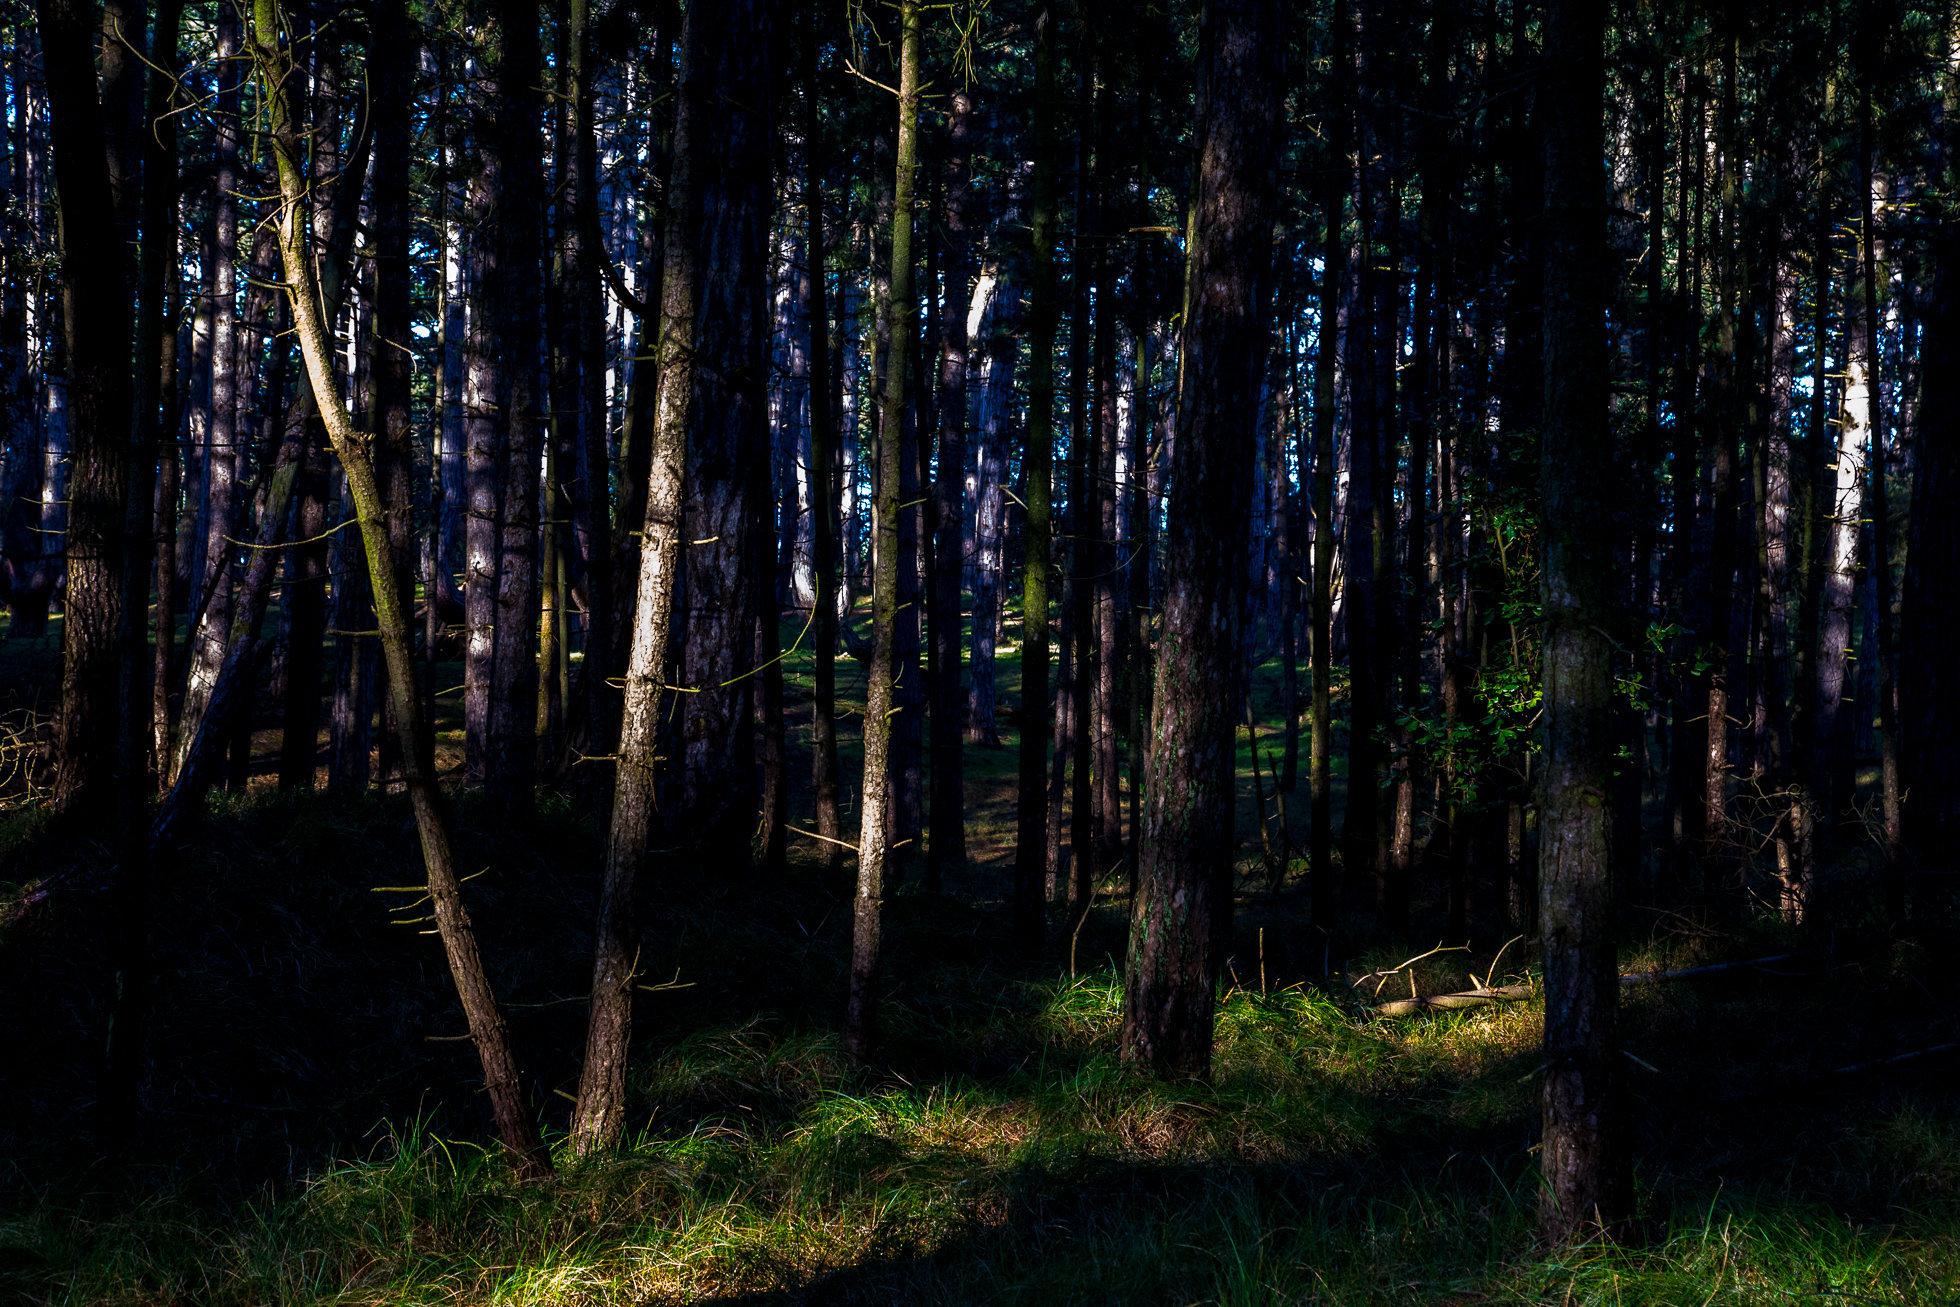 The_Wood-9019.jpg